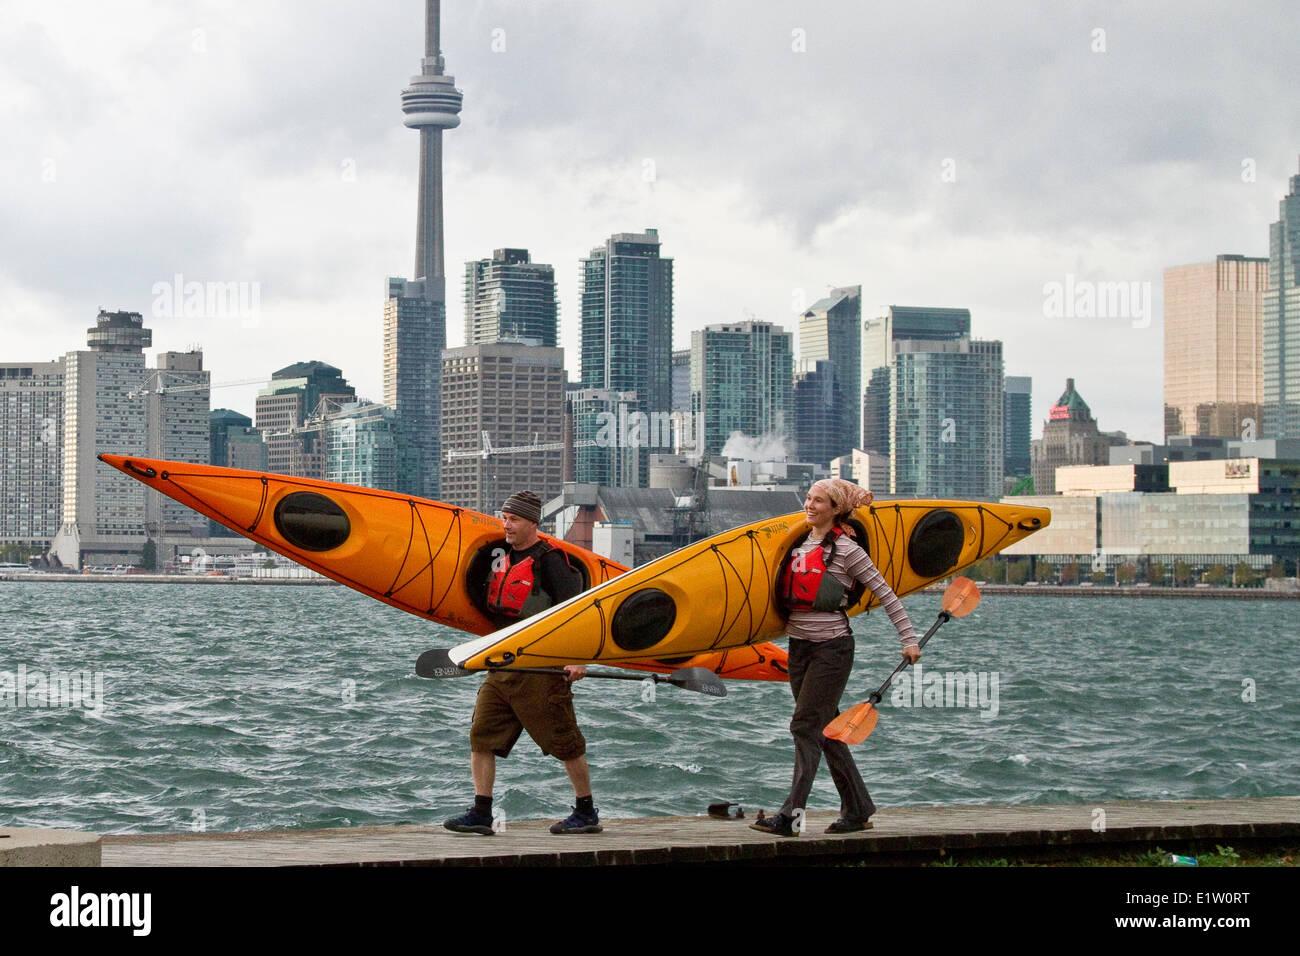 Coppia giovane trasportare kayak da Lago Ontario, Toronto waterfront, Toronto, Ontario, Canada. Immagini Stock